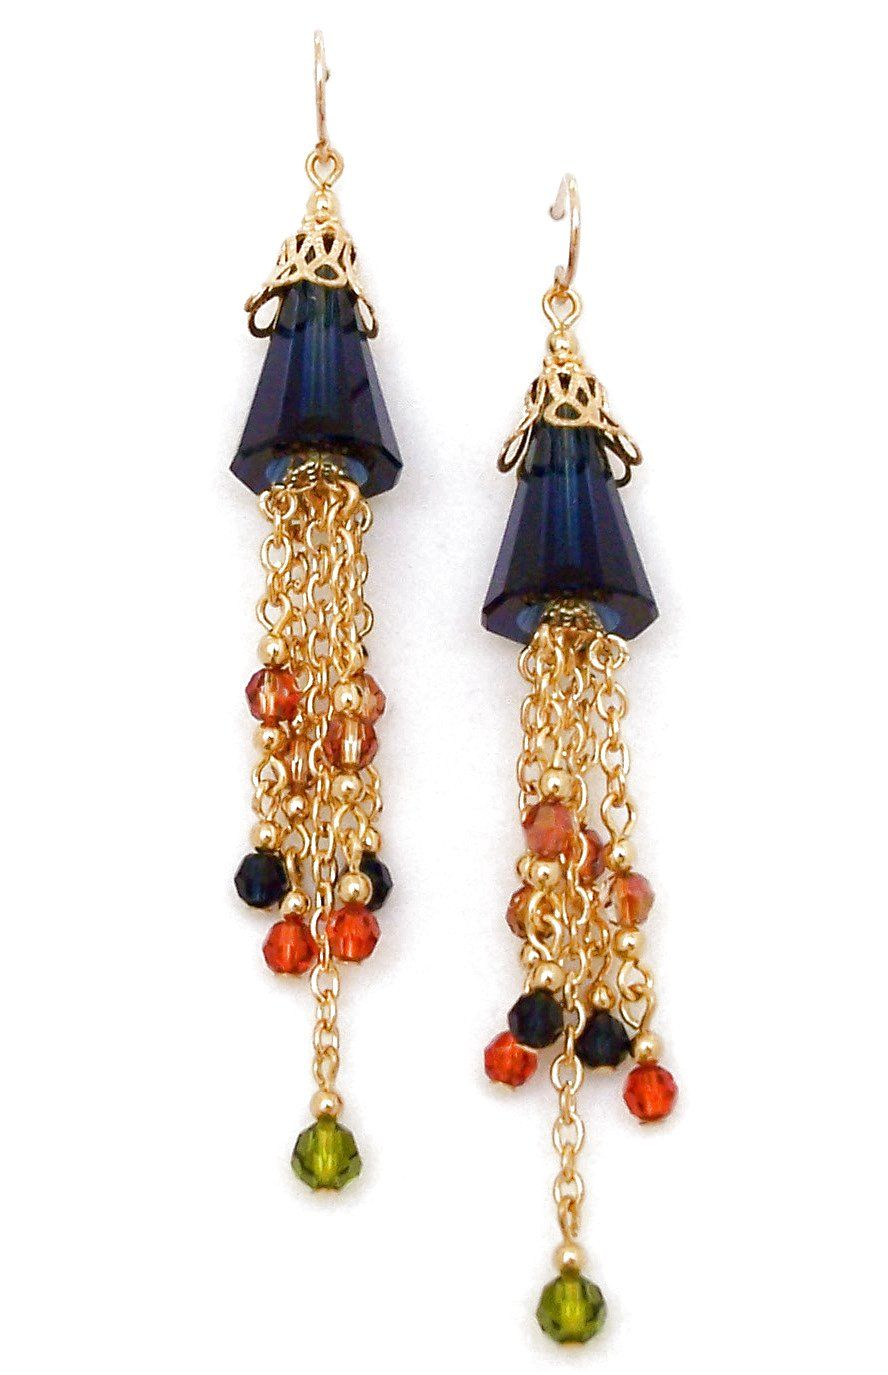 1cdc593f5 03-04-885 Fall Fantasy Crystal Beaded Earrings | Fall Fashion ...